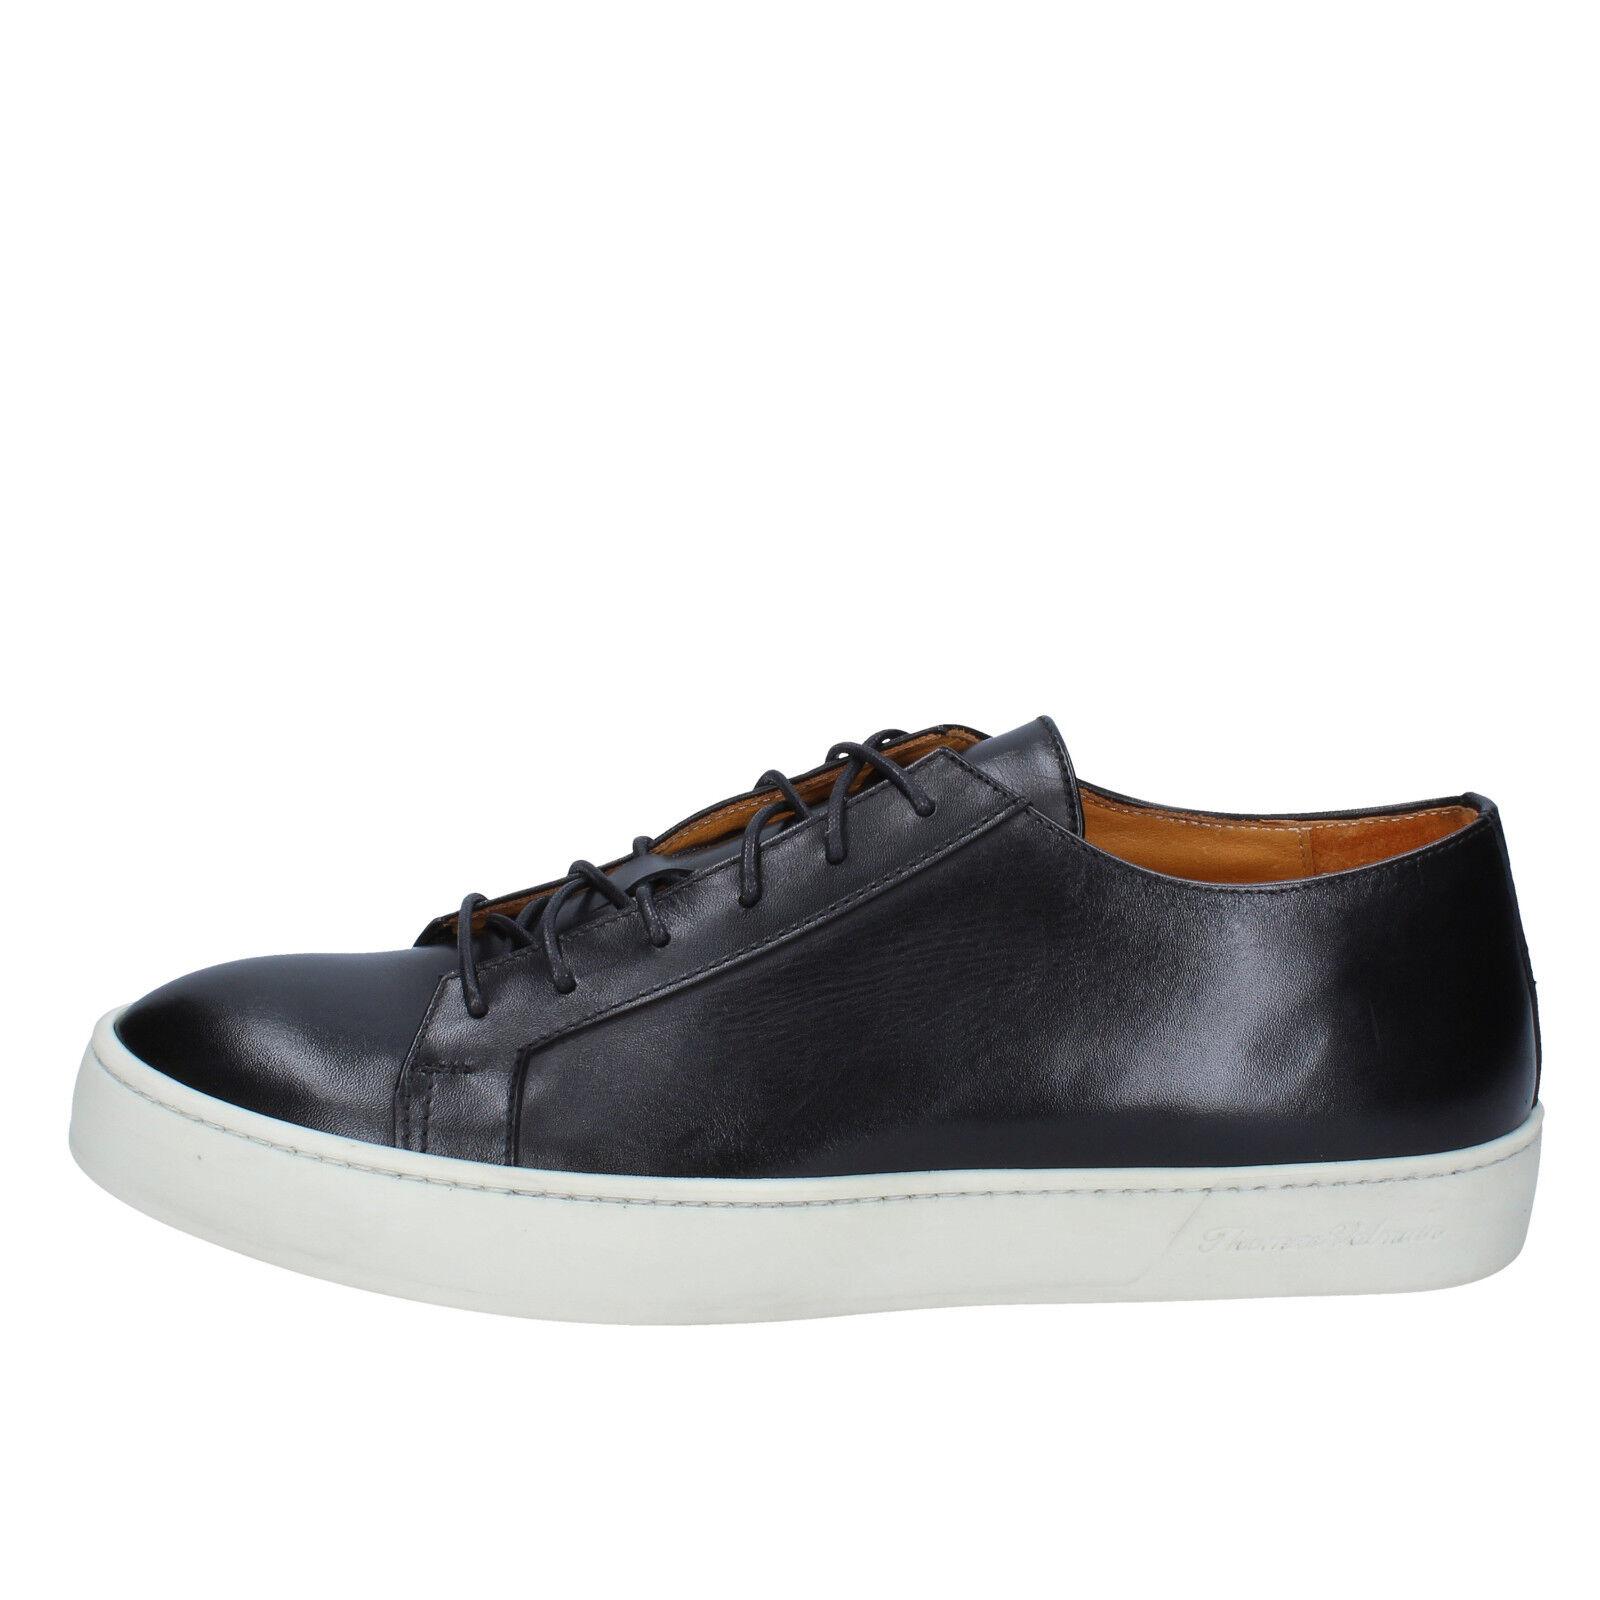 Men's shoes THOMAS VALMAIN 9 (EU 42) sneakers black leather AB804-42